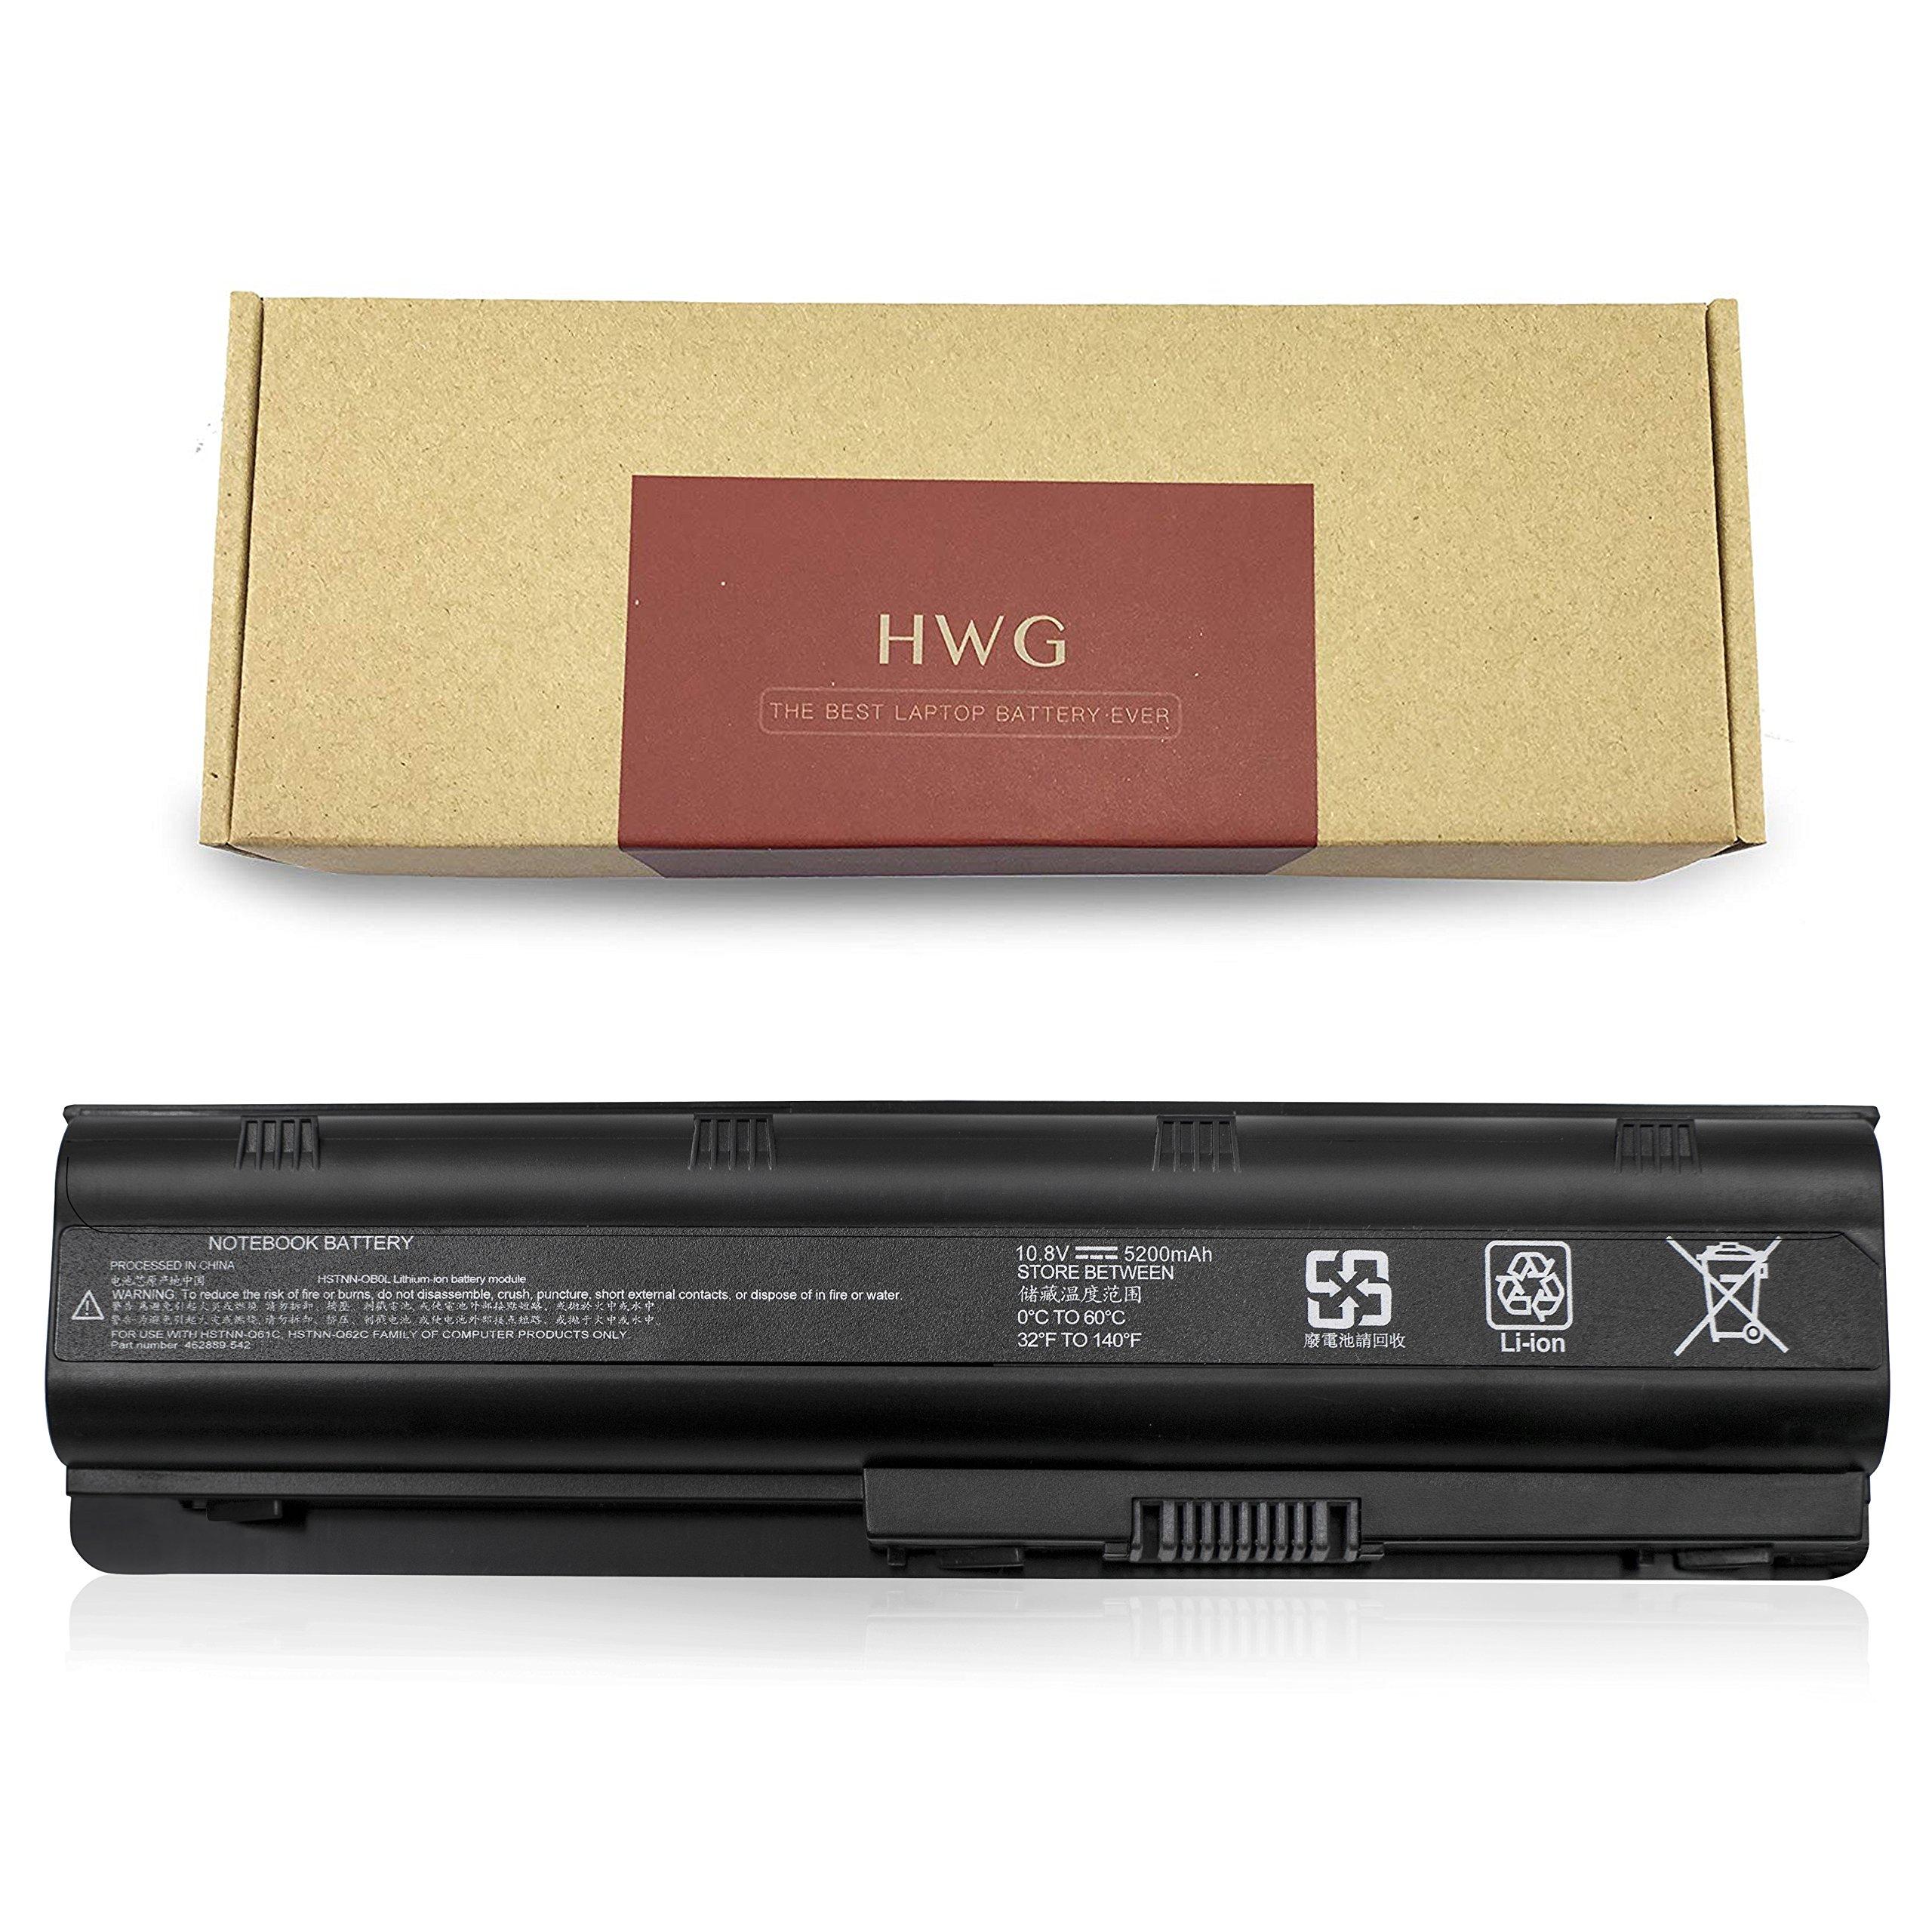 HWG DV4 battery For 462890-422 CQ40 CQ50 CQ60 CQ70 G50 G60 G70-100 G70 Series HDX16 HDXX16-1000 HSTNN-CB73 HSTNN-IB72 HSTNN-XB72 462889-121 Pavilion DV4-2145DX DV6-2150US DV6-2155DX [6-cell, 5200mAh]